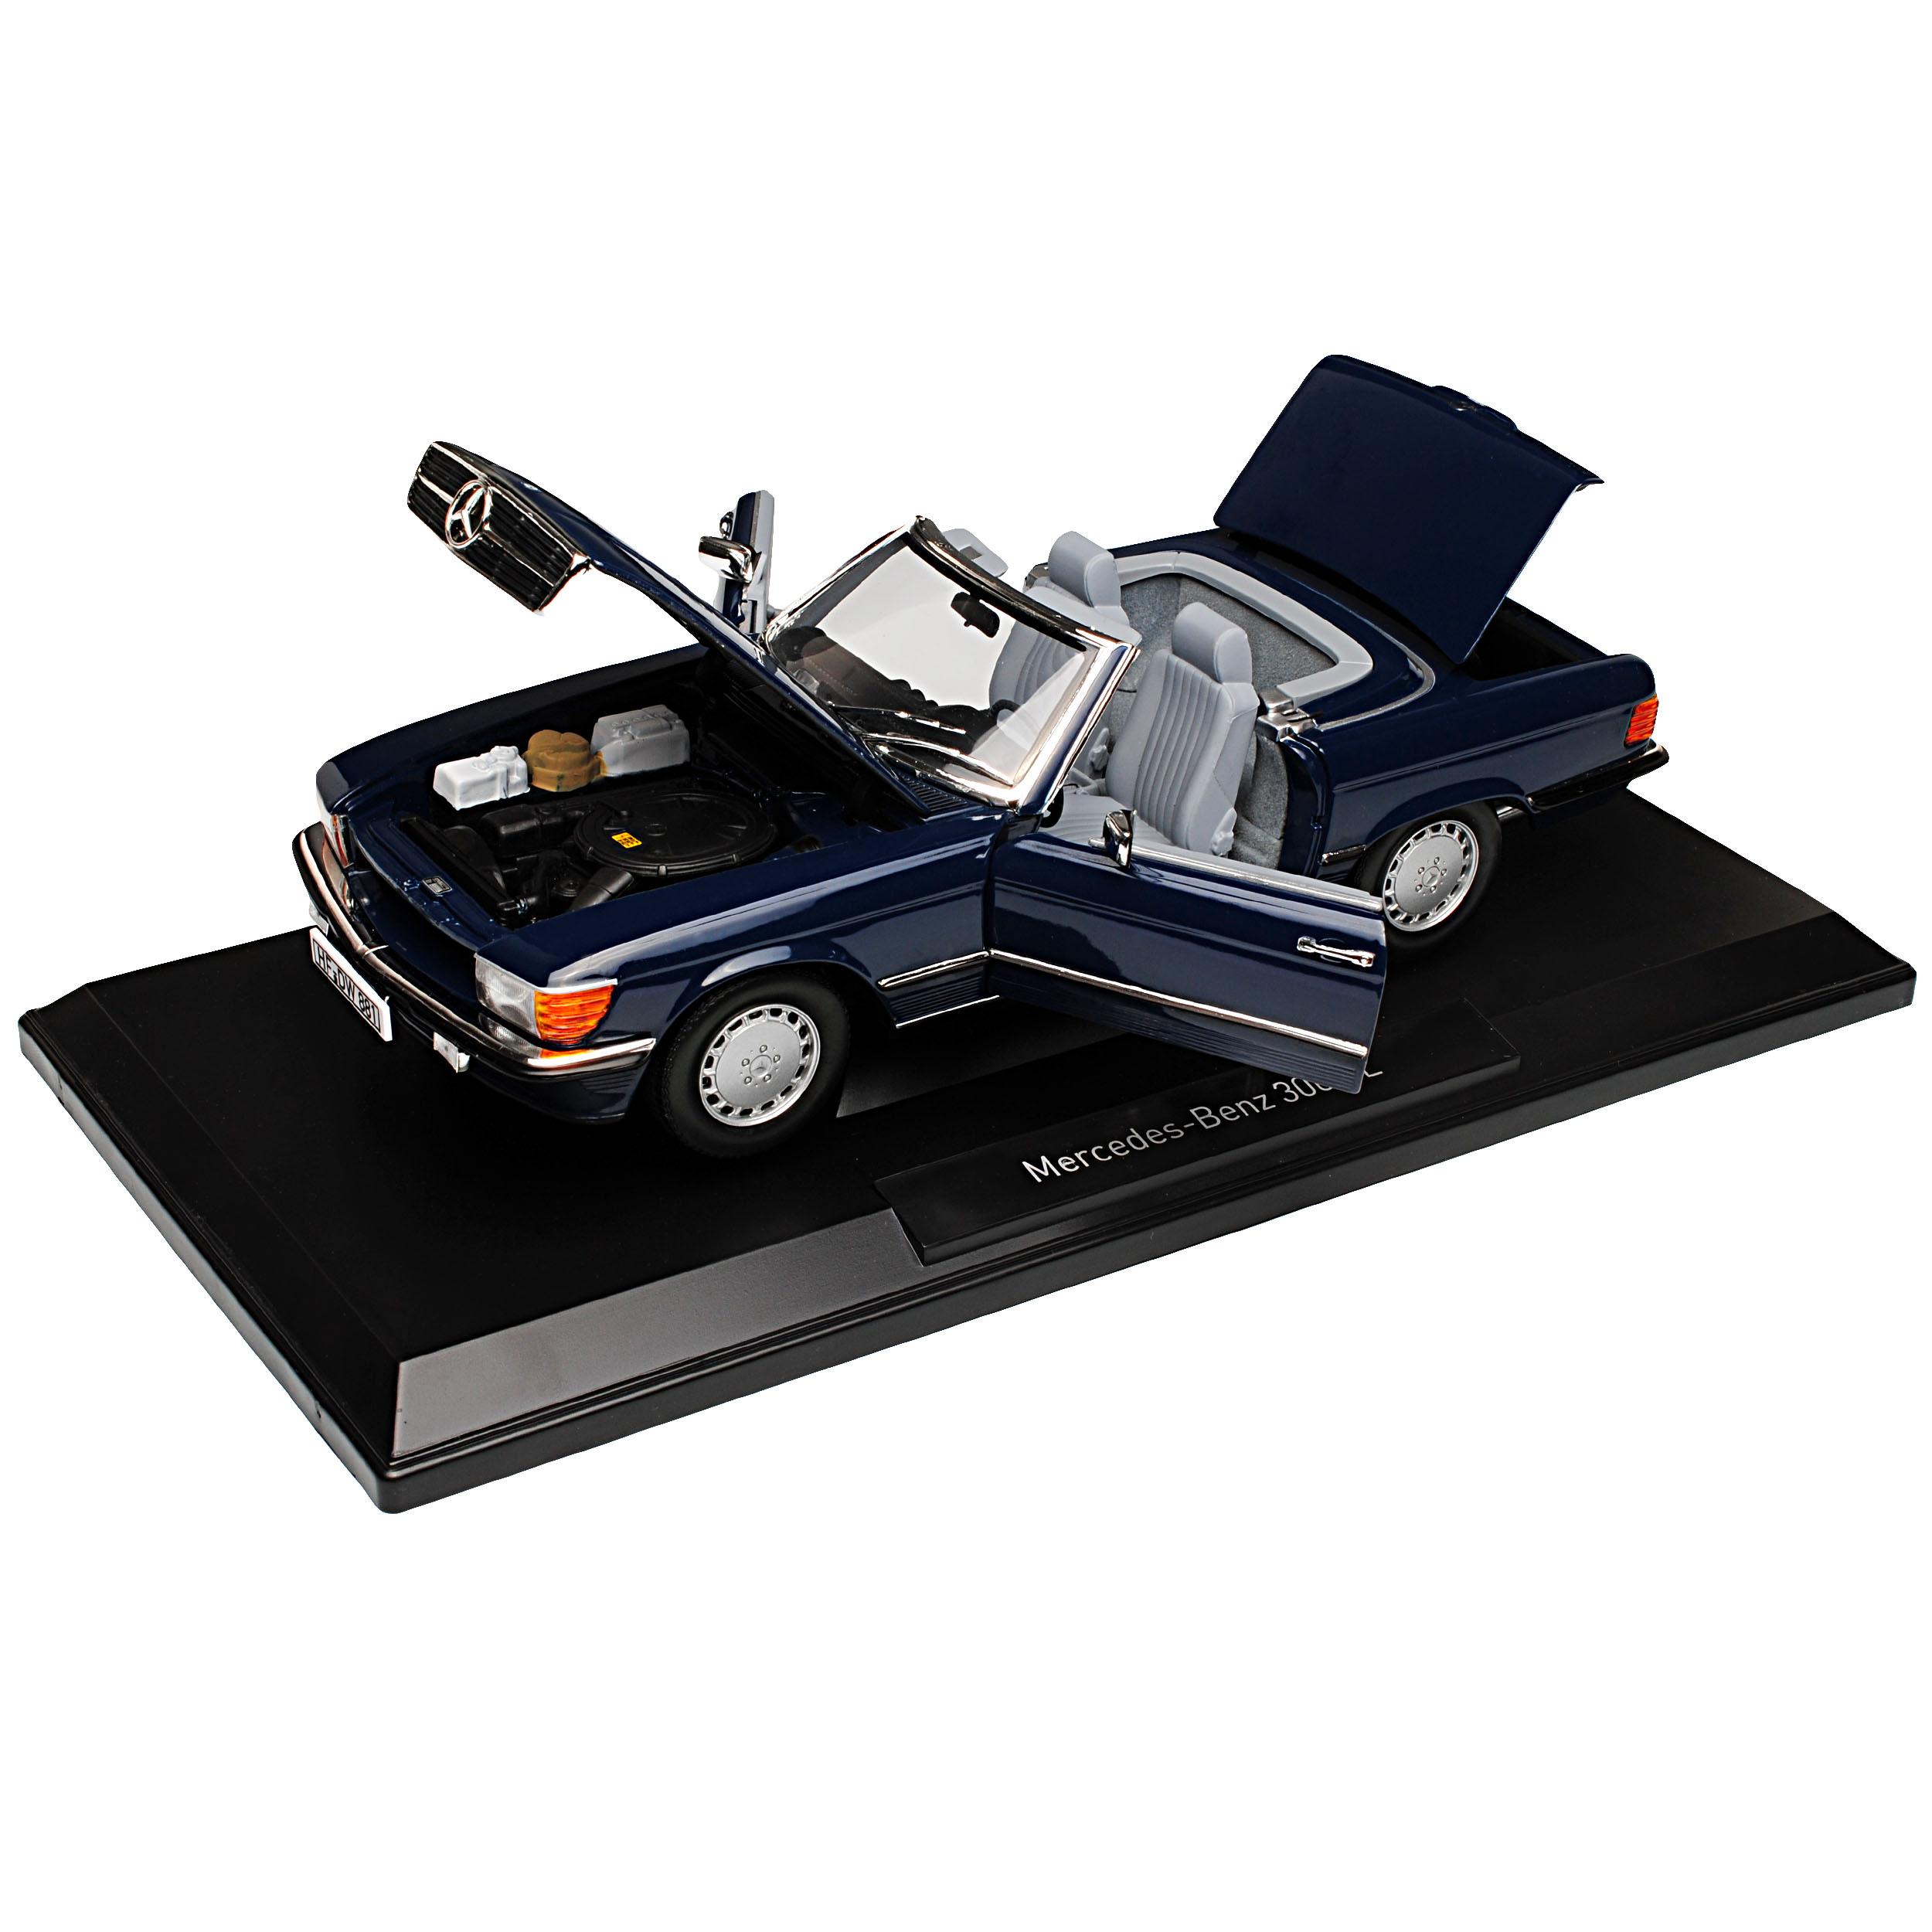 Mercedes Benz R 107-300 SL Cabrio//Softtop Blau 1:18 Neu OVP